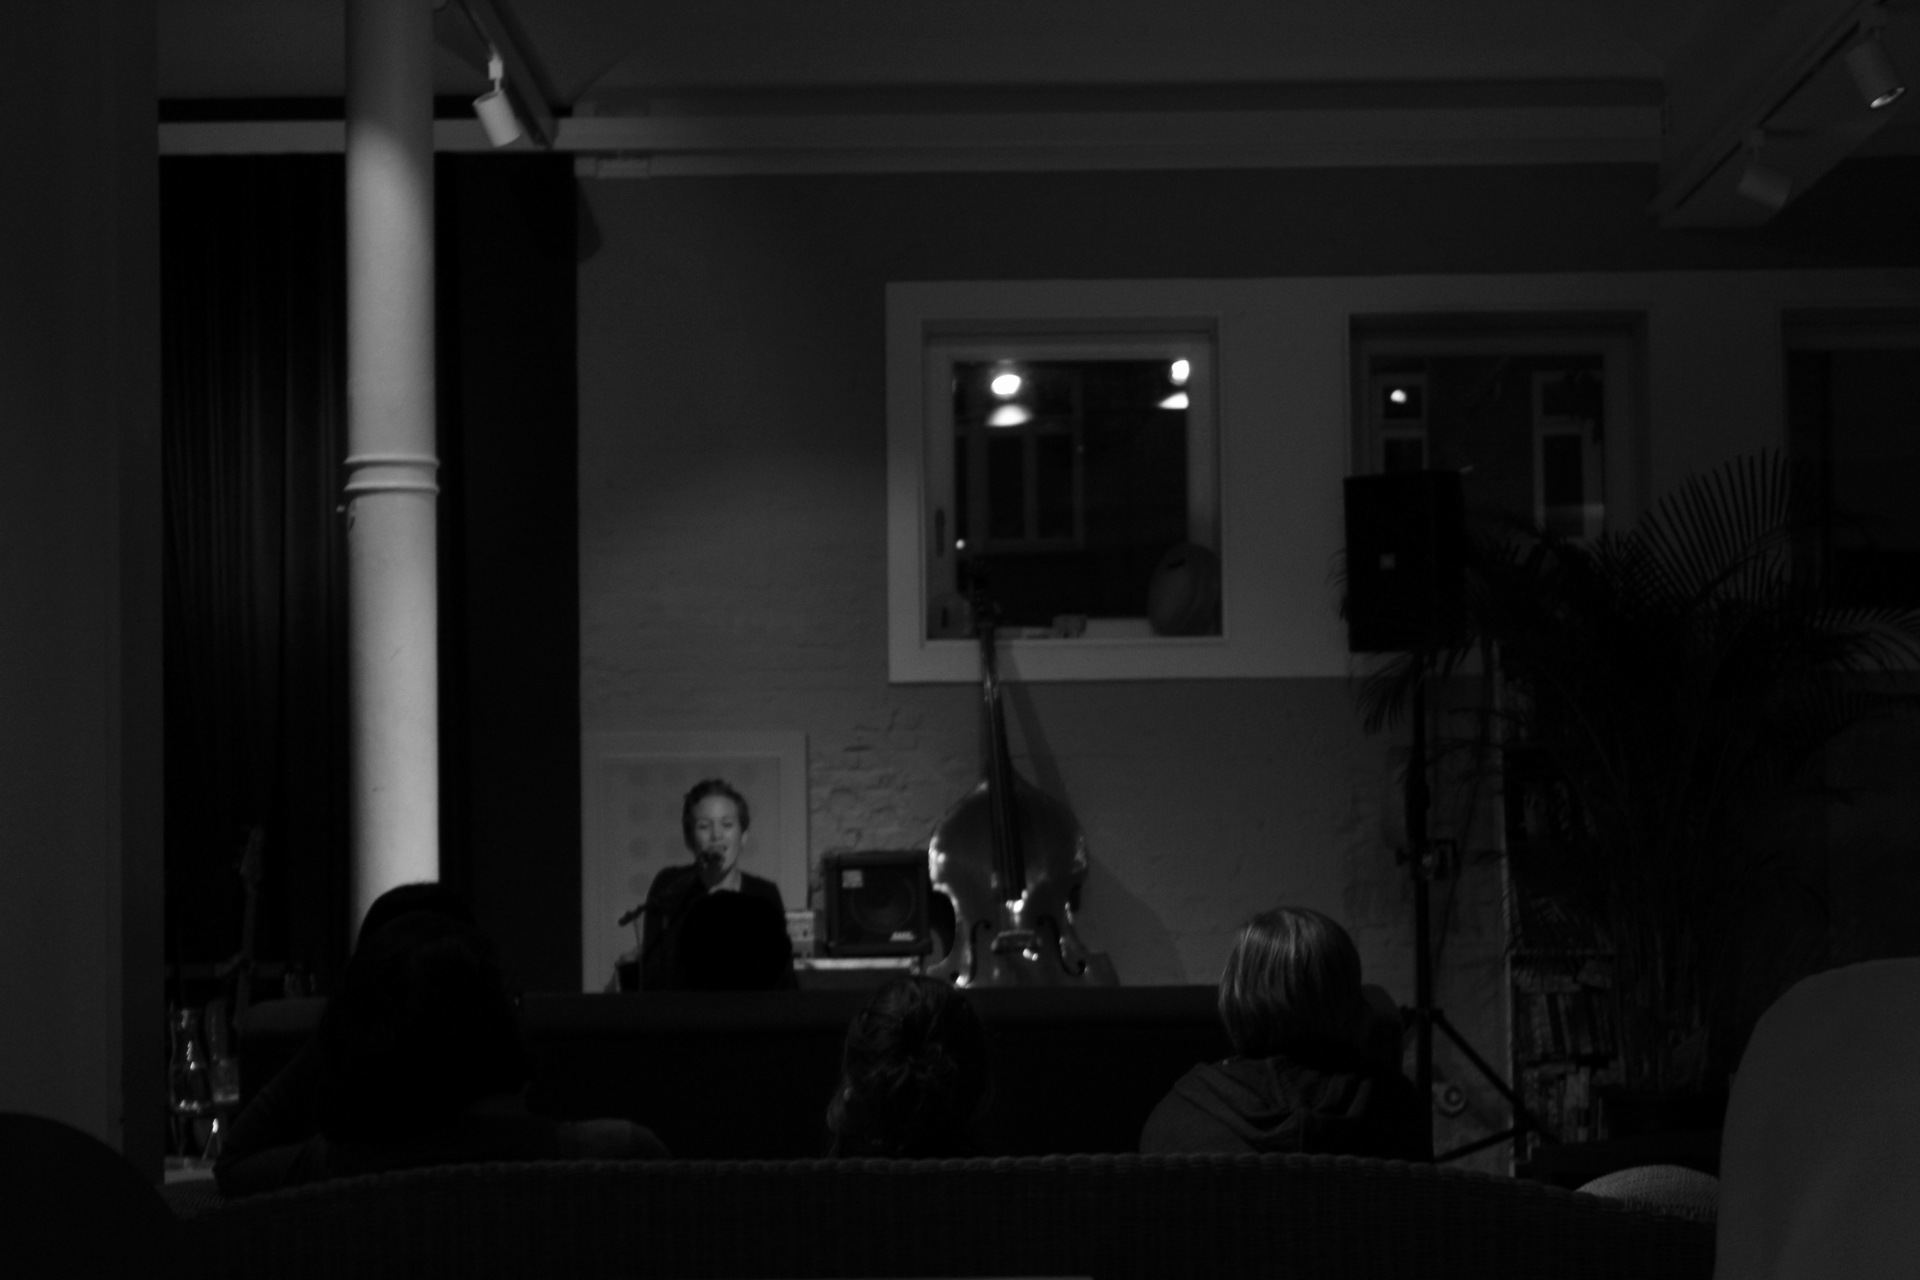 2019-09-21 Konzert Amalia Chikh mosaique LGFoto_LuisLópez (4)